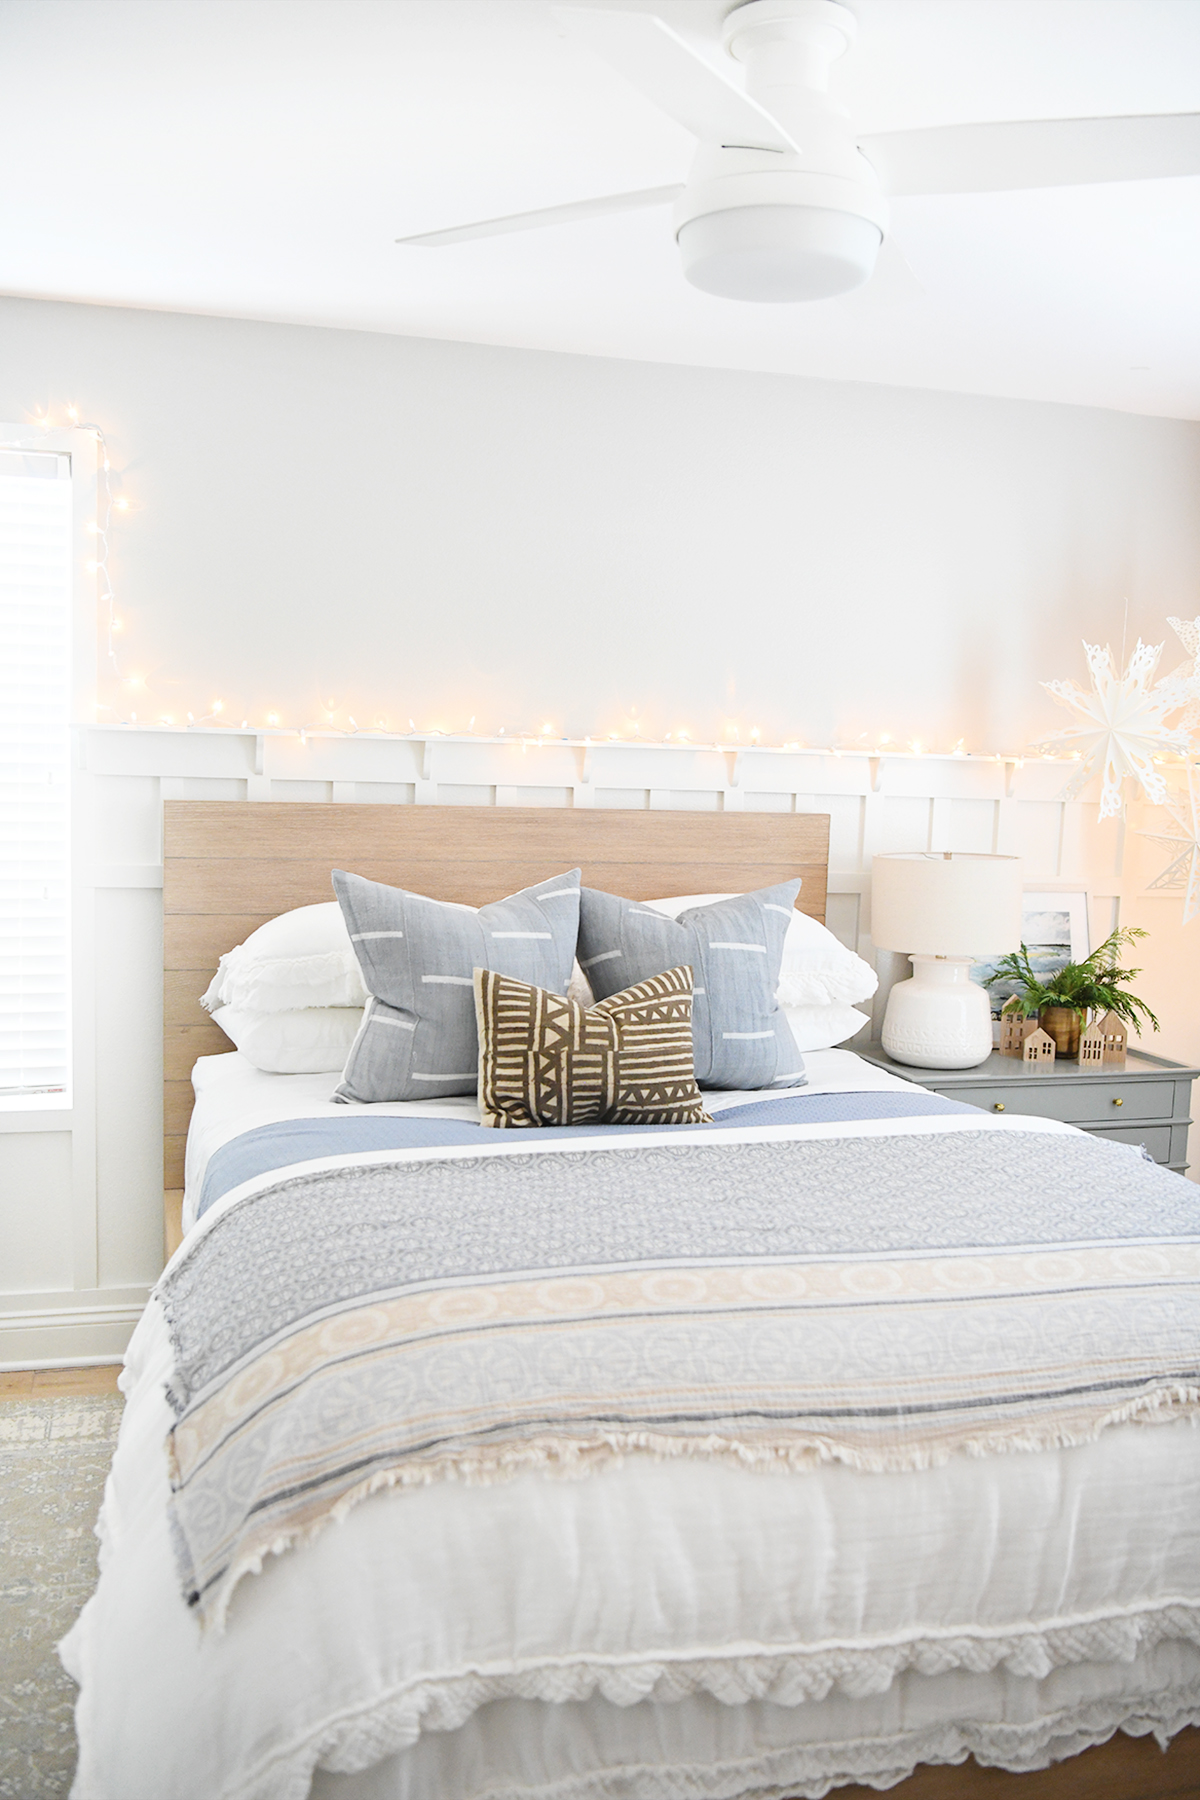 Christmas bedroom decor ideas ashleys room 1